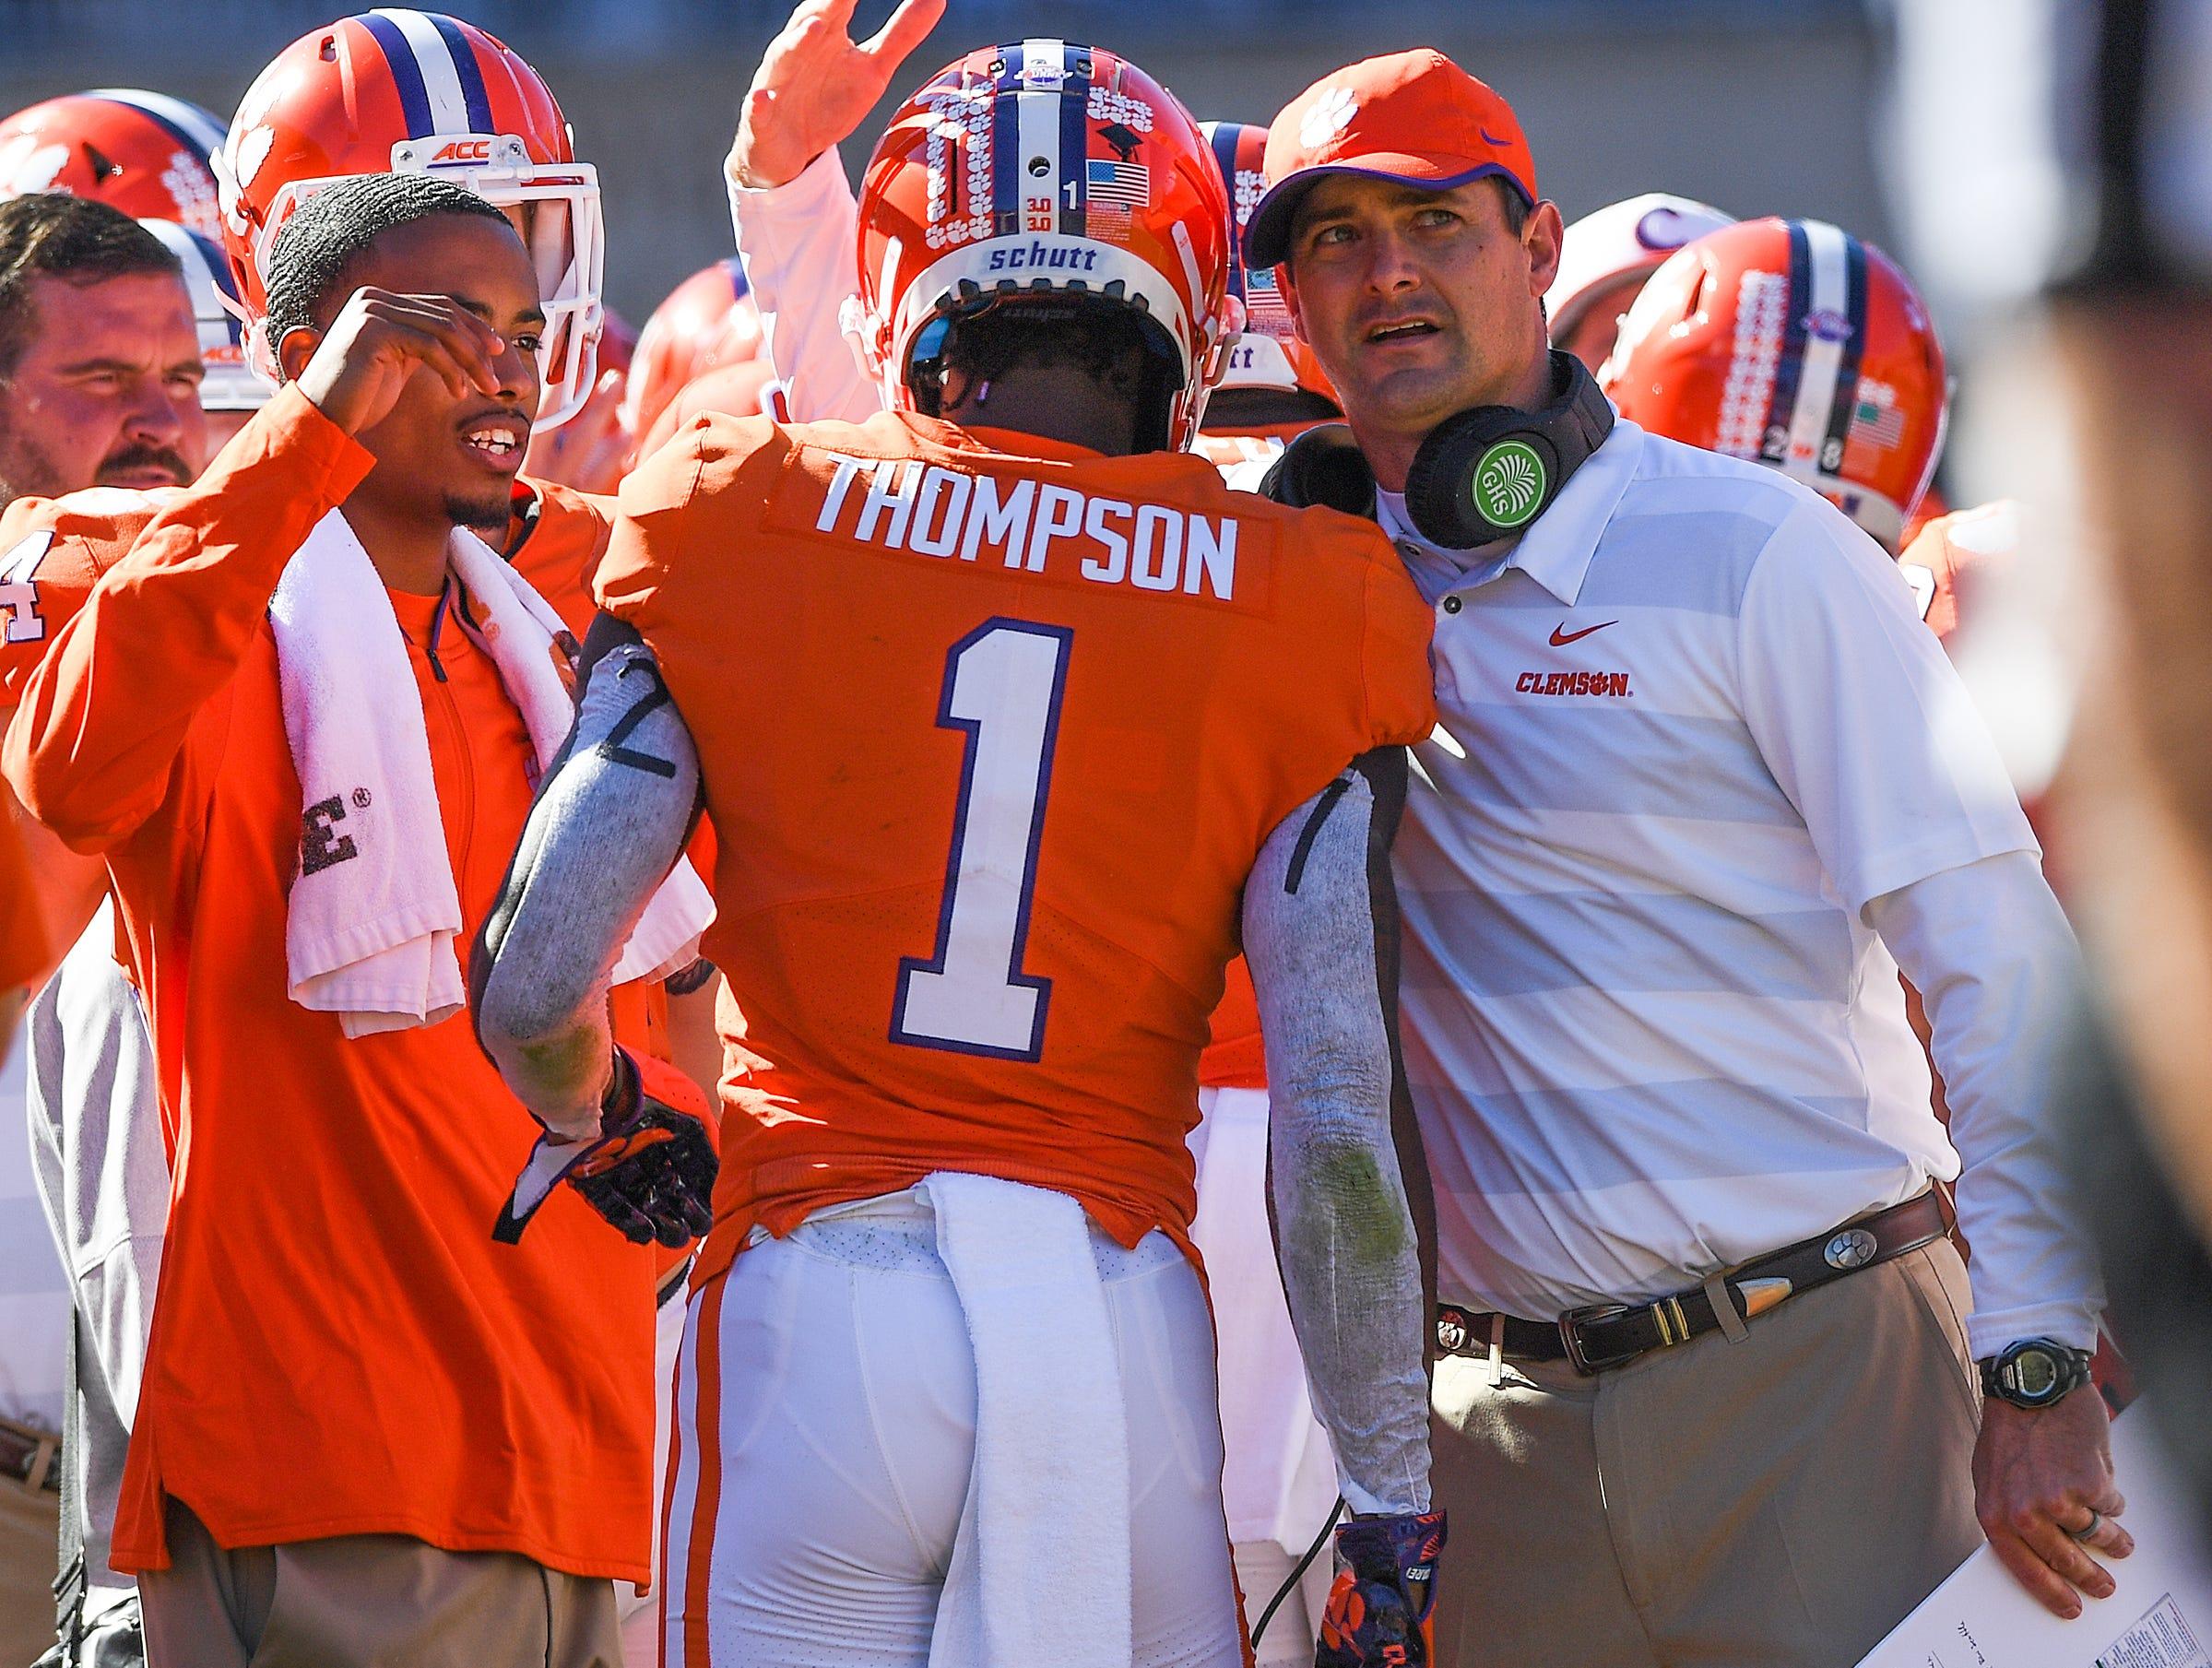 Clemson co-offensive coordinator Jeff Scott congratulates wide receiver Trevion Thompson (1) after a touchdown reception against Louisville during the 3rd quarter Saturday, November 3, 2018 at Clemson's Memorial Stadium.